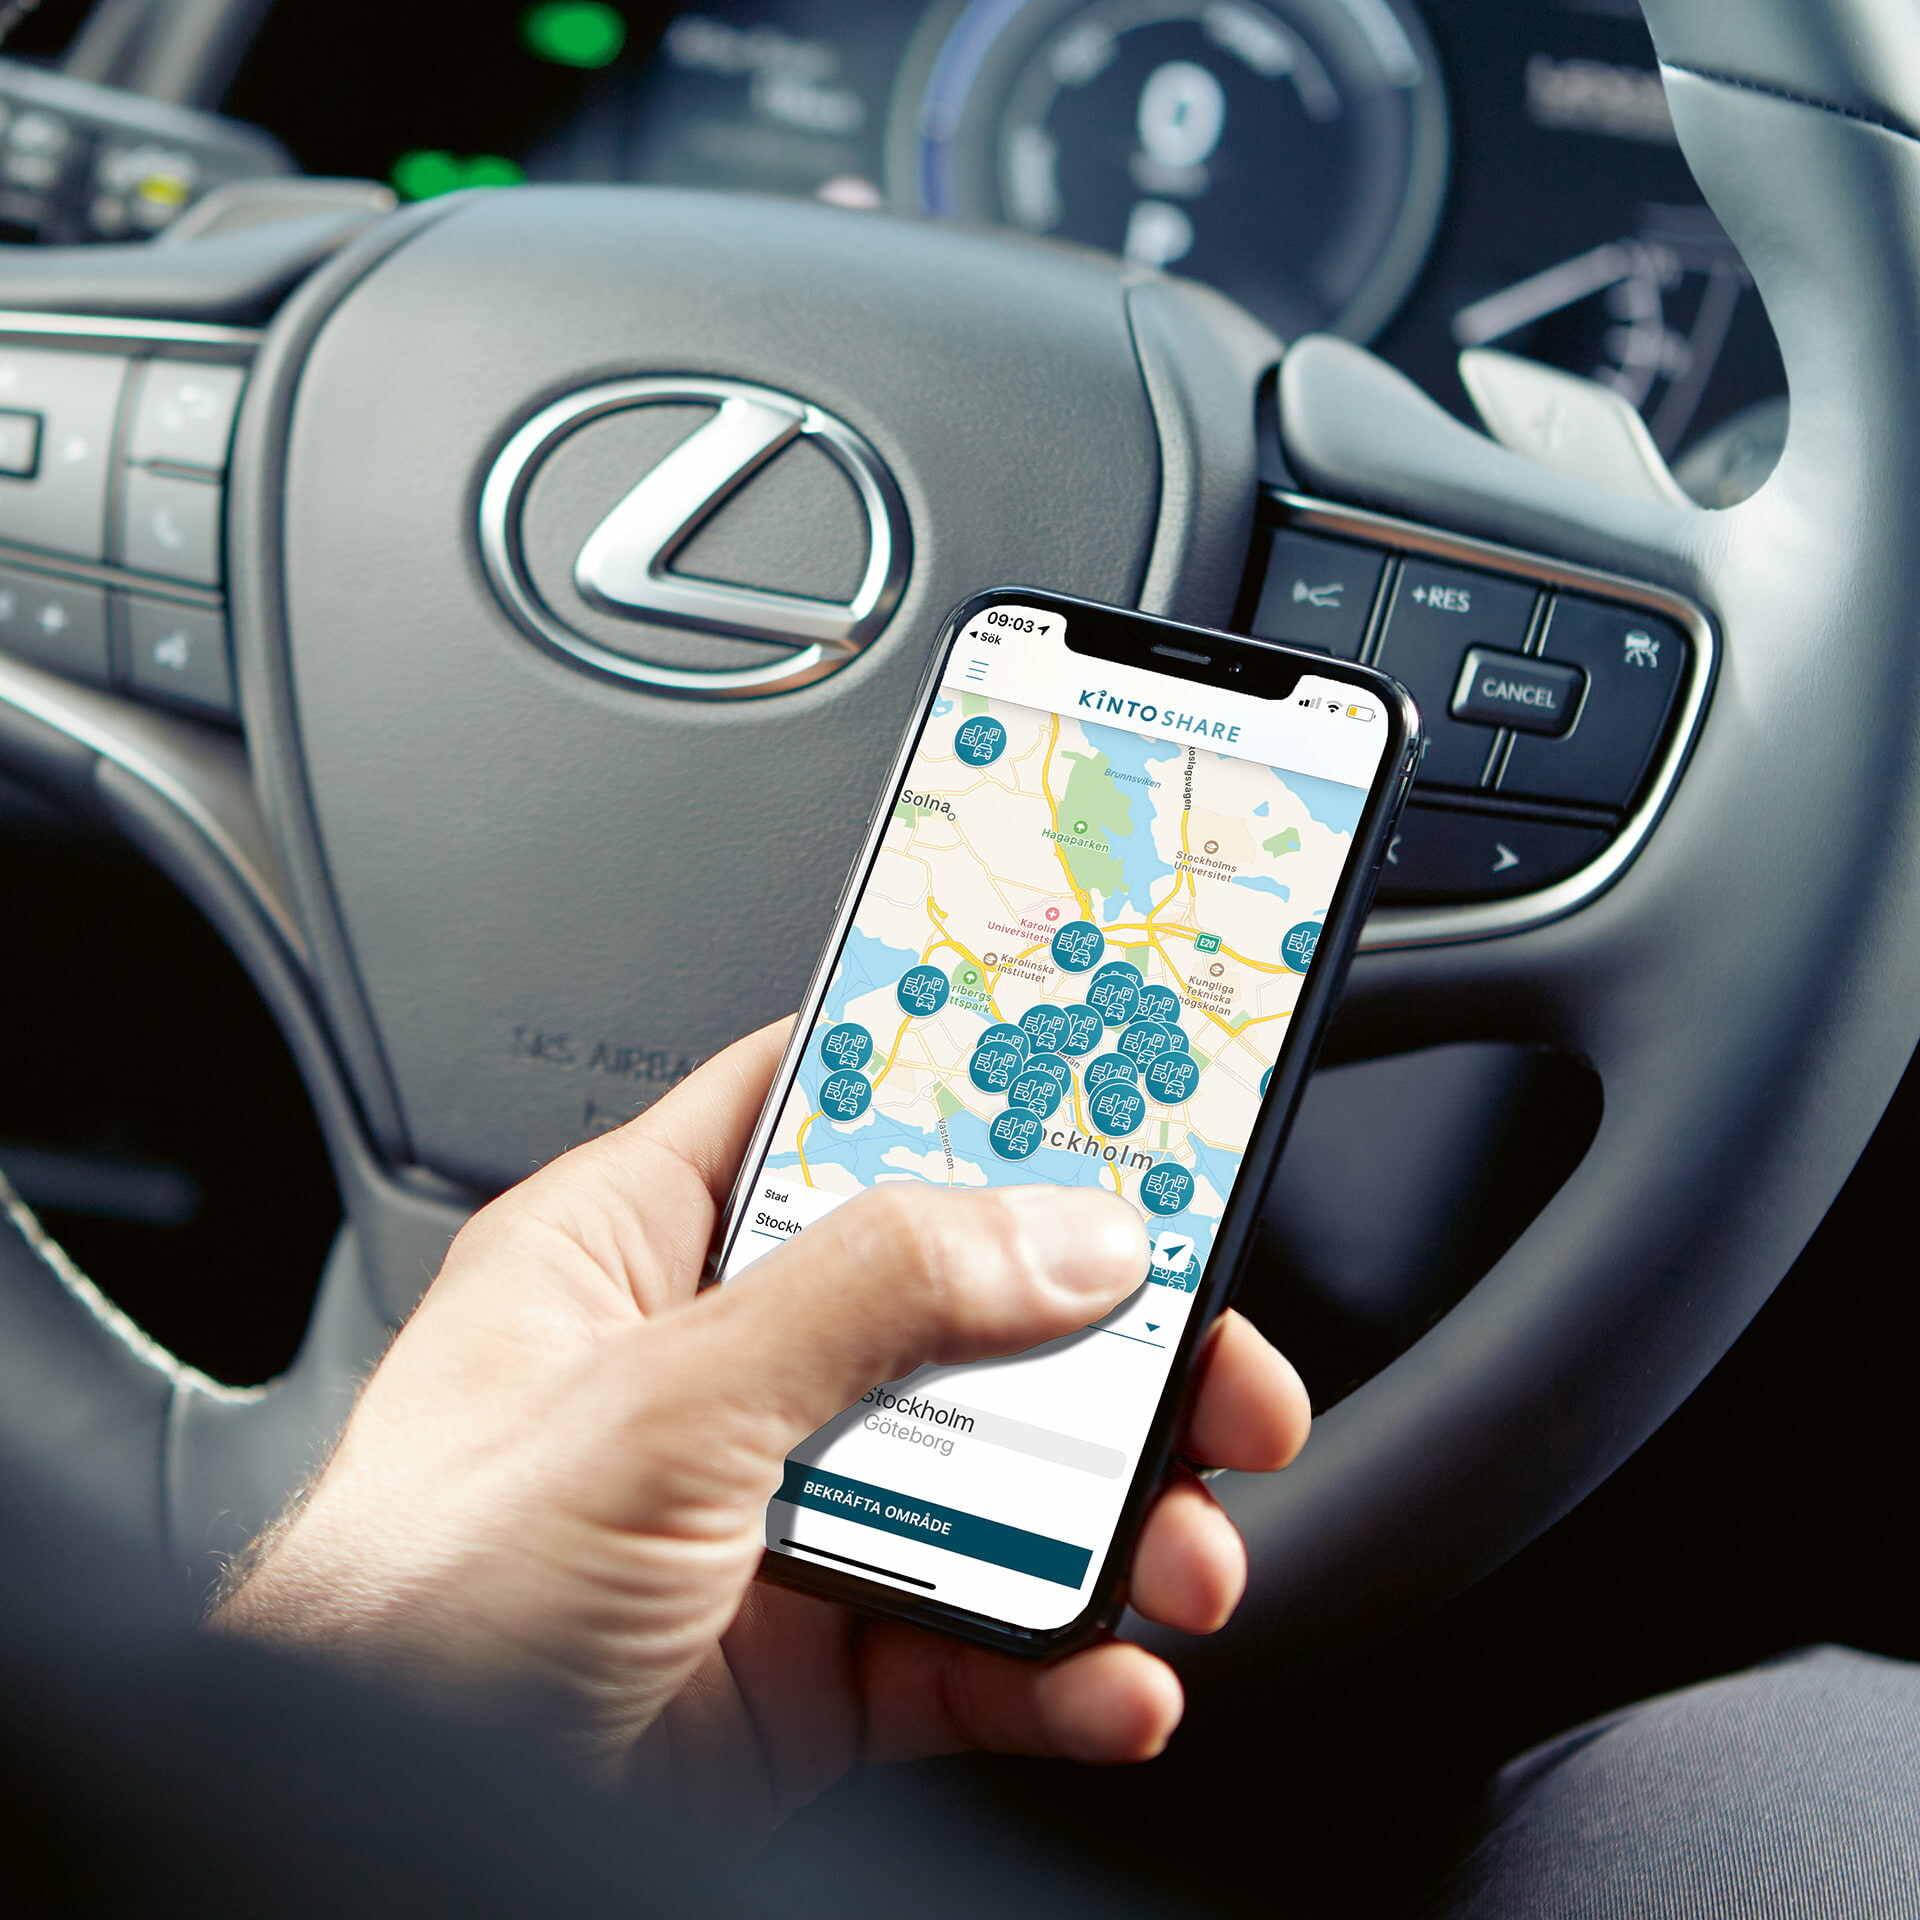 Kinto Share mobilapp Lexus